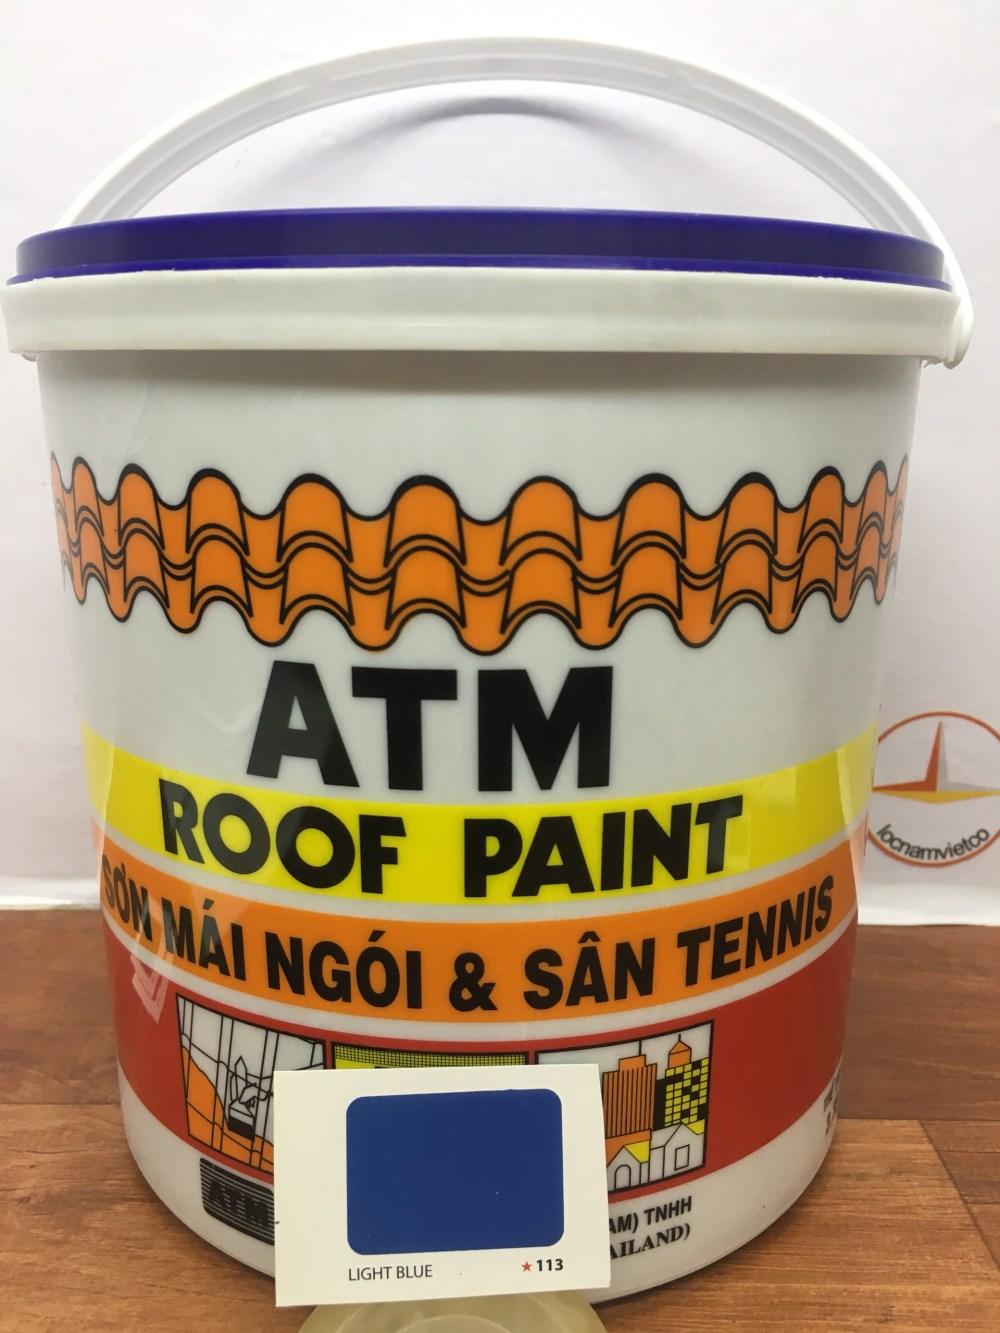 SON MAI NGOI & TENNIS ATM ROOF PAINT LIGHT BLUE 113 (2)